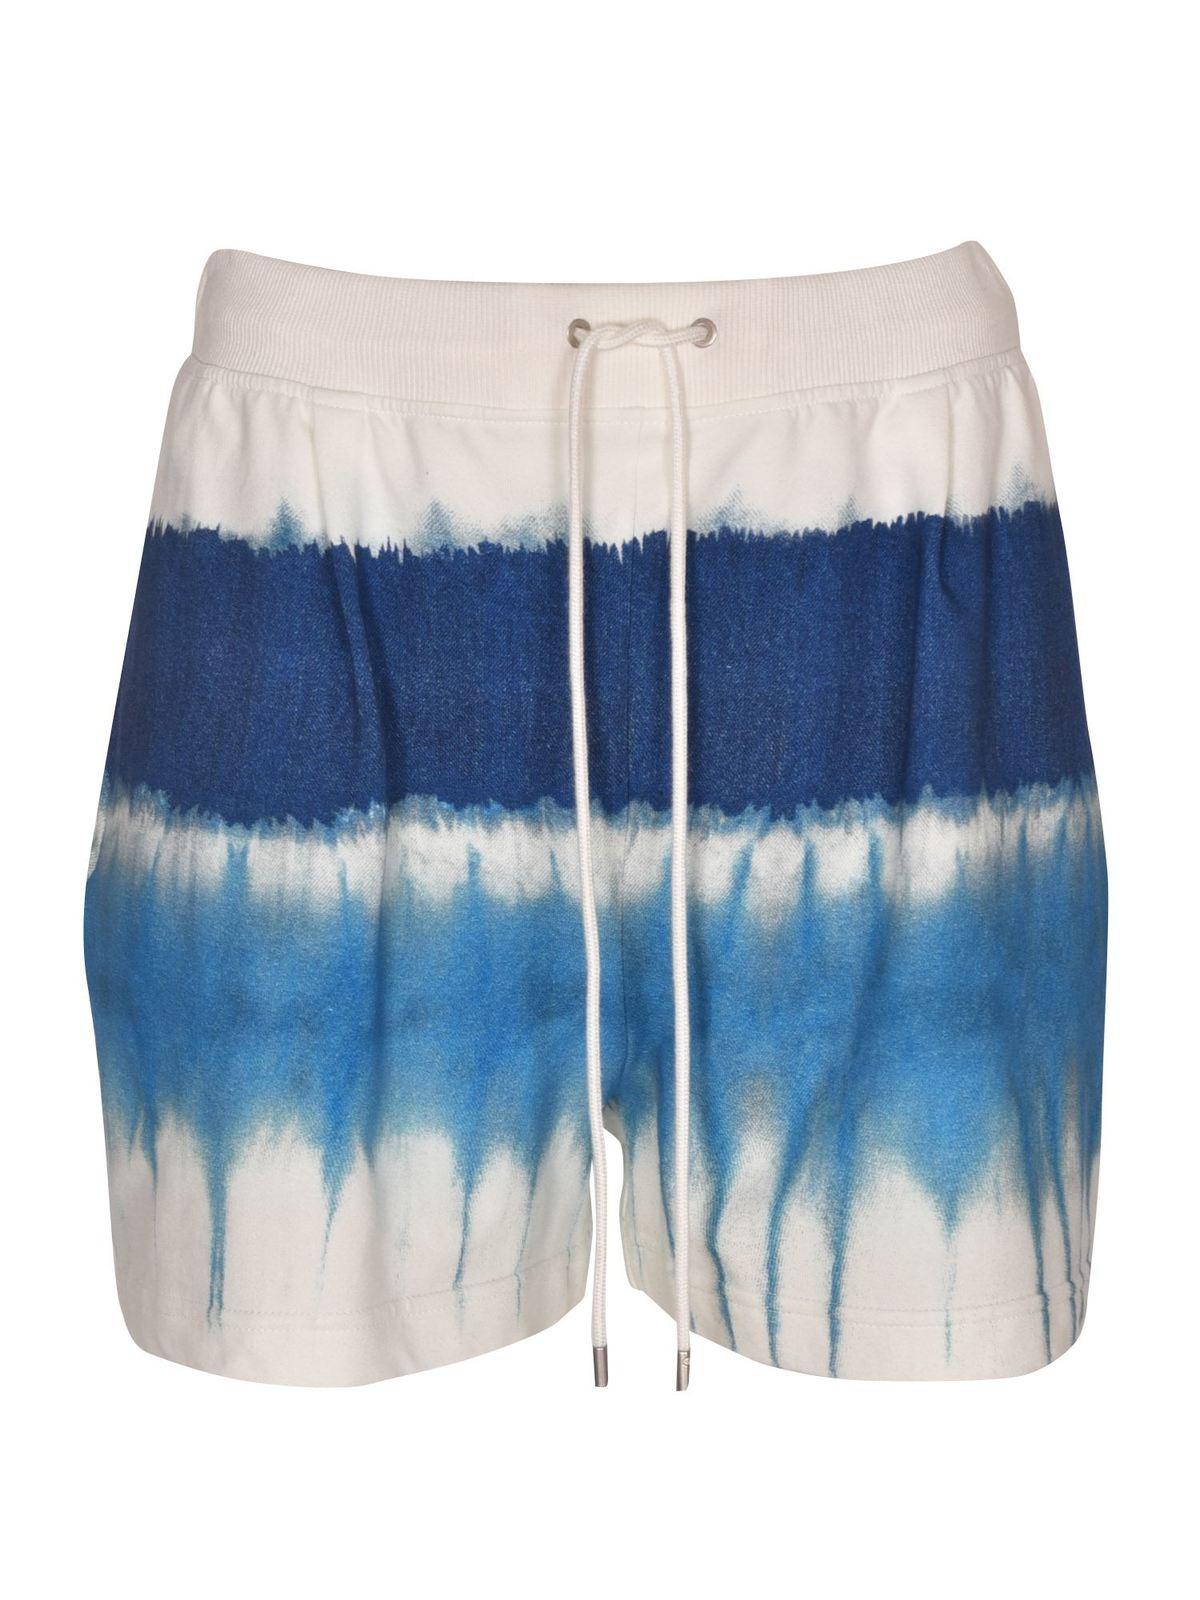 Alberta Ferretti Clothing TIE DYE SHORTS IN LIGHT BLUE